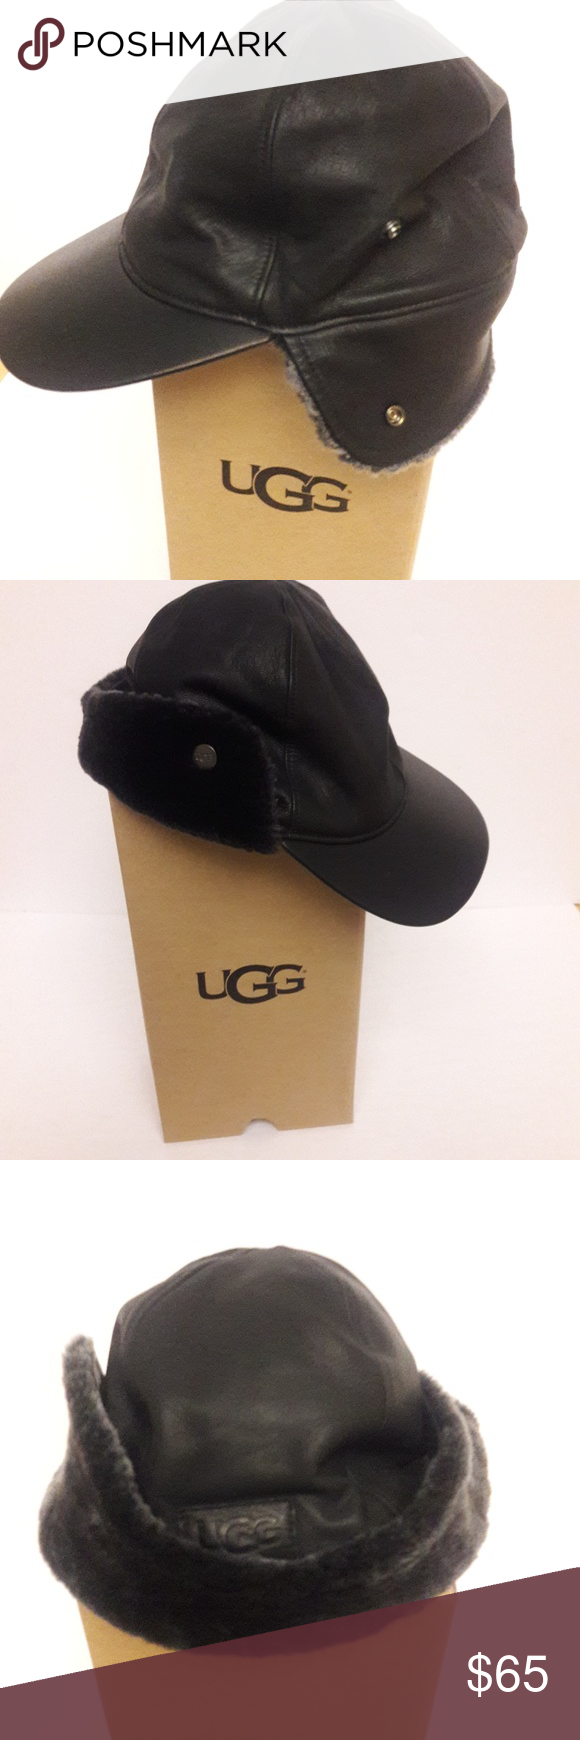 23929cc84 New Men's Leather UGG hat NWOB, Mens UGG black leather hat with ...